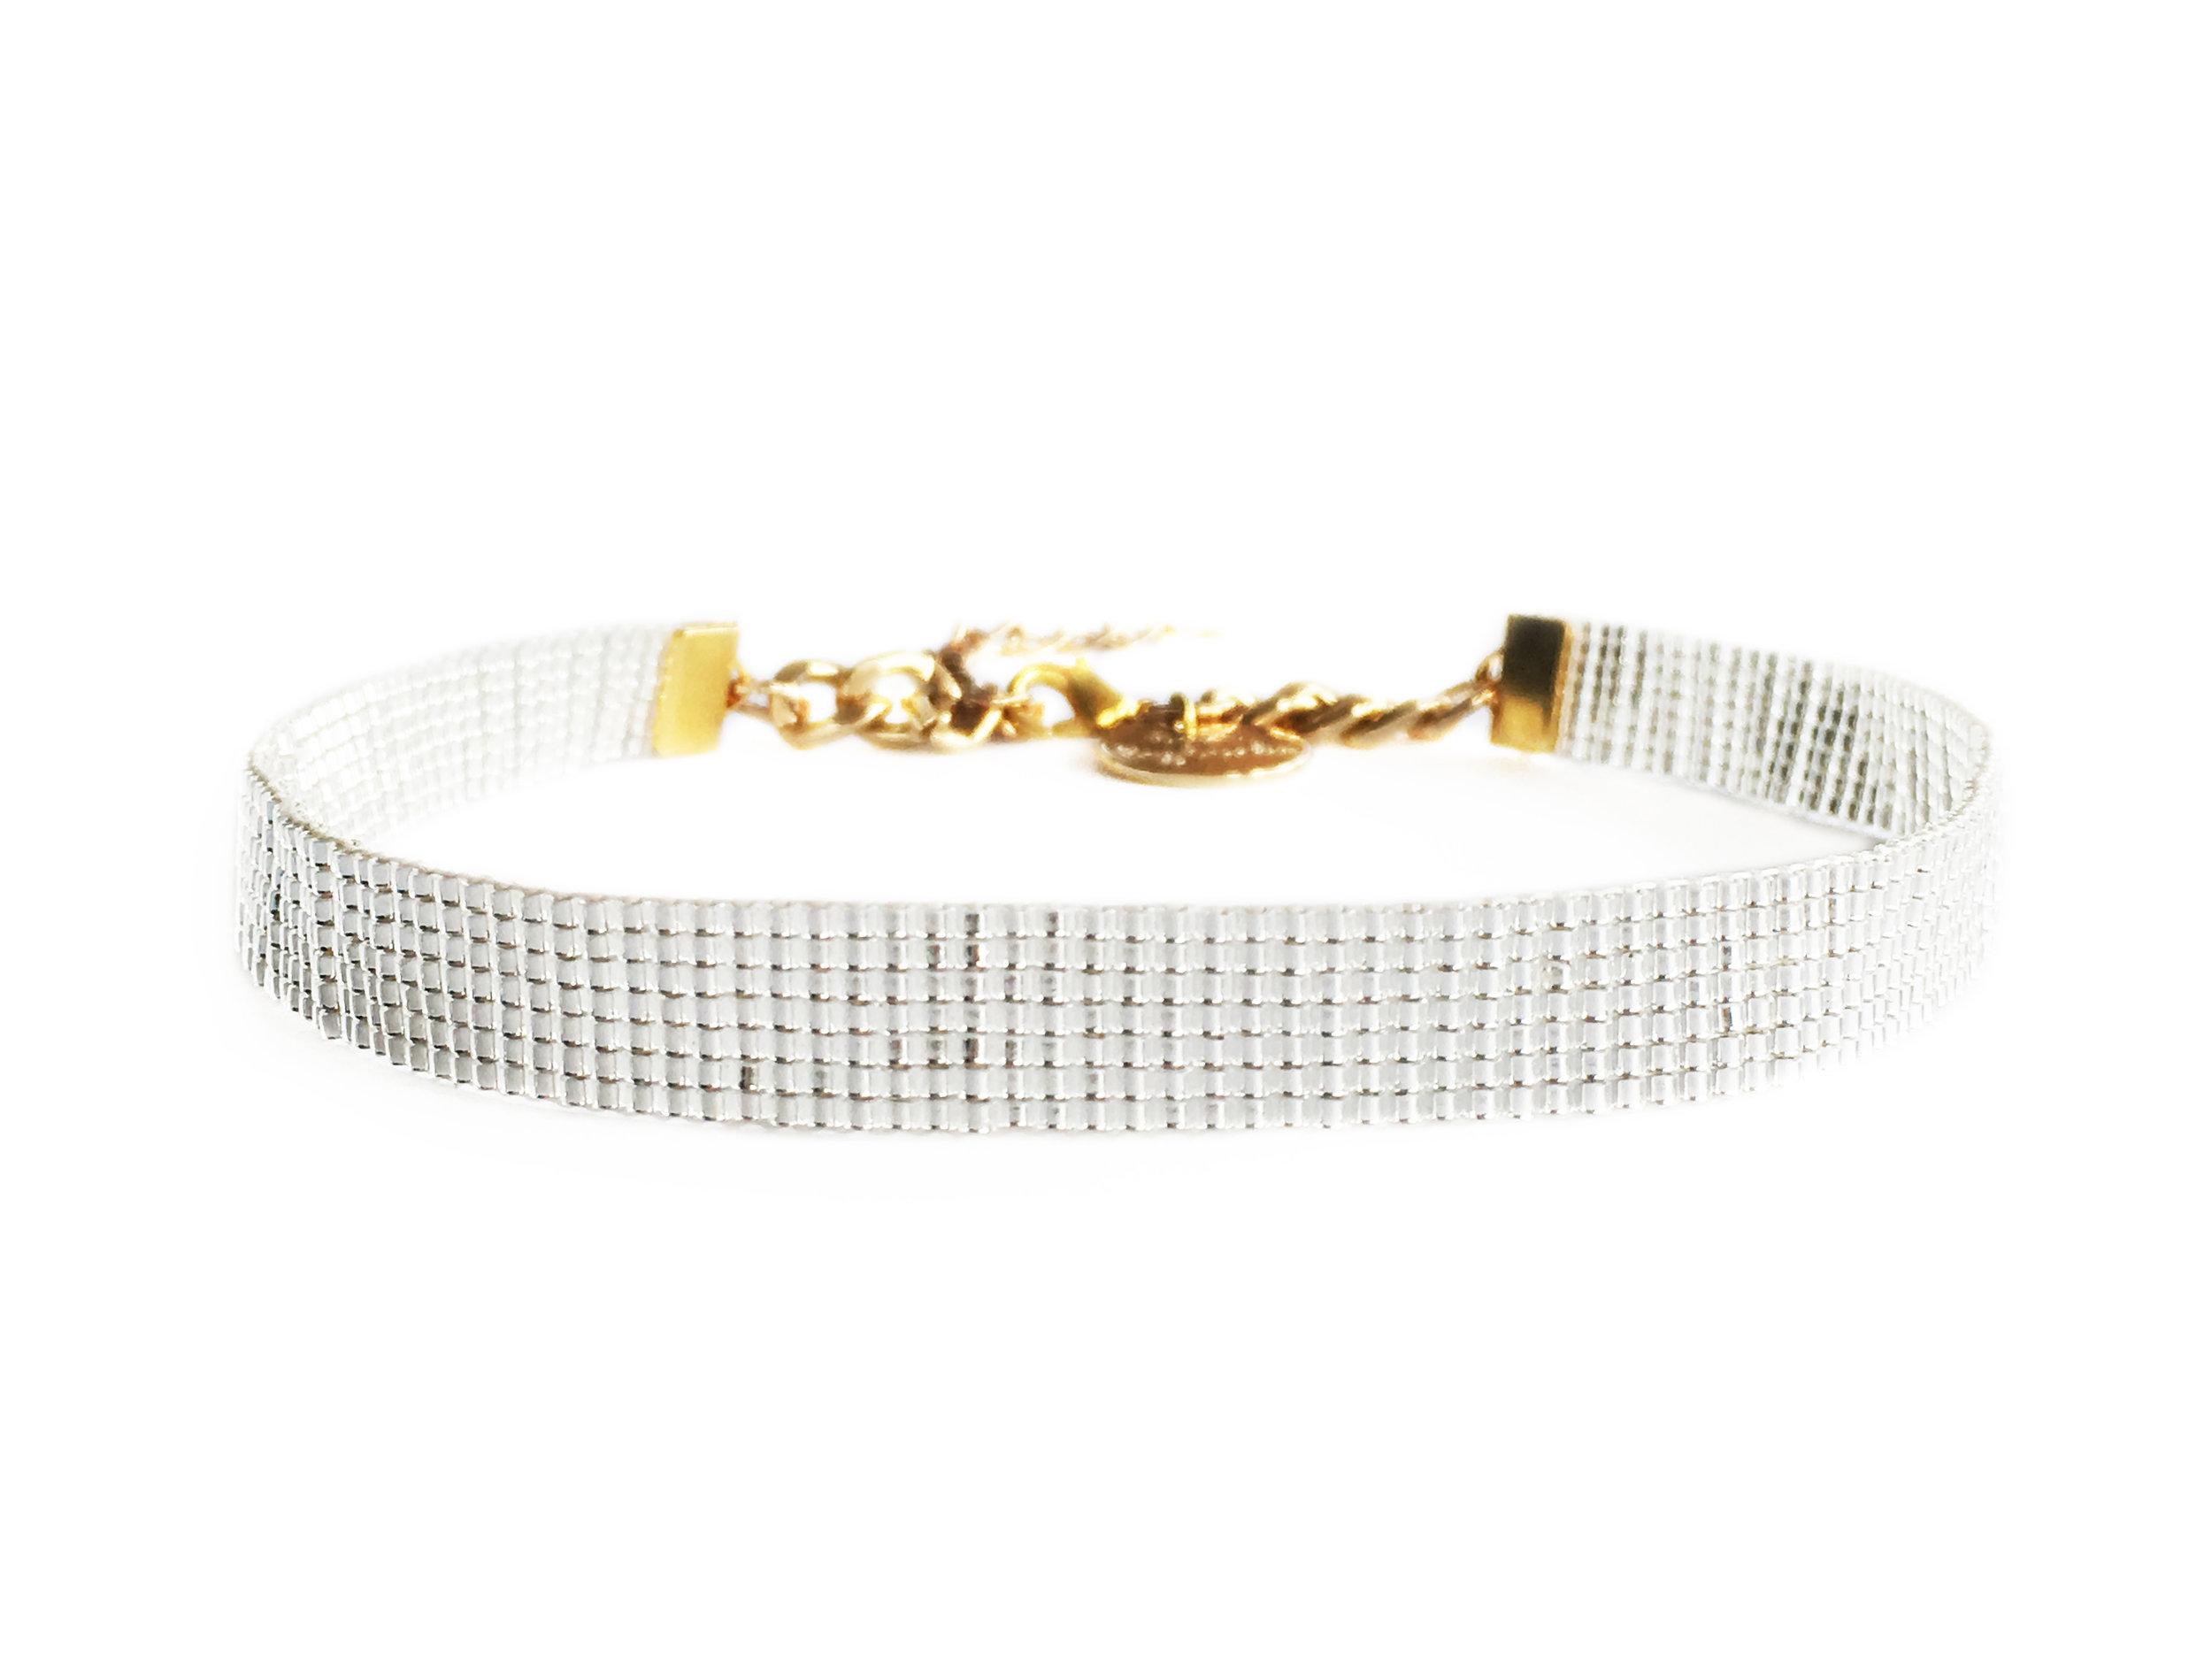 luxury designer silver choker by British jewellery designer shh by sadie